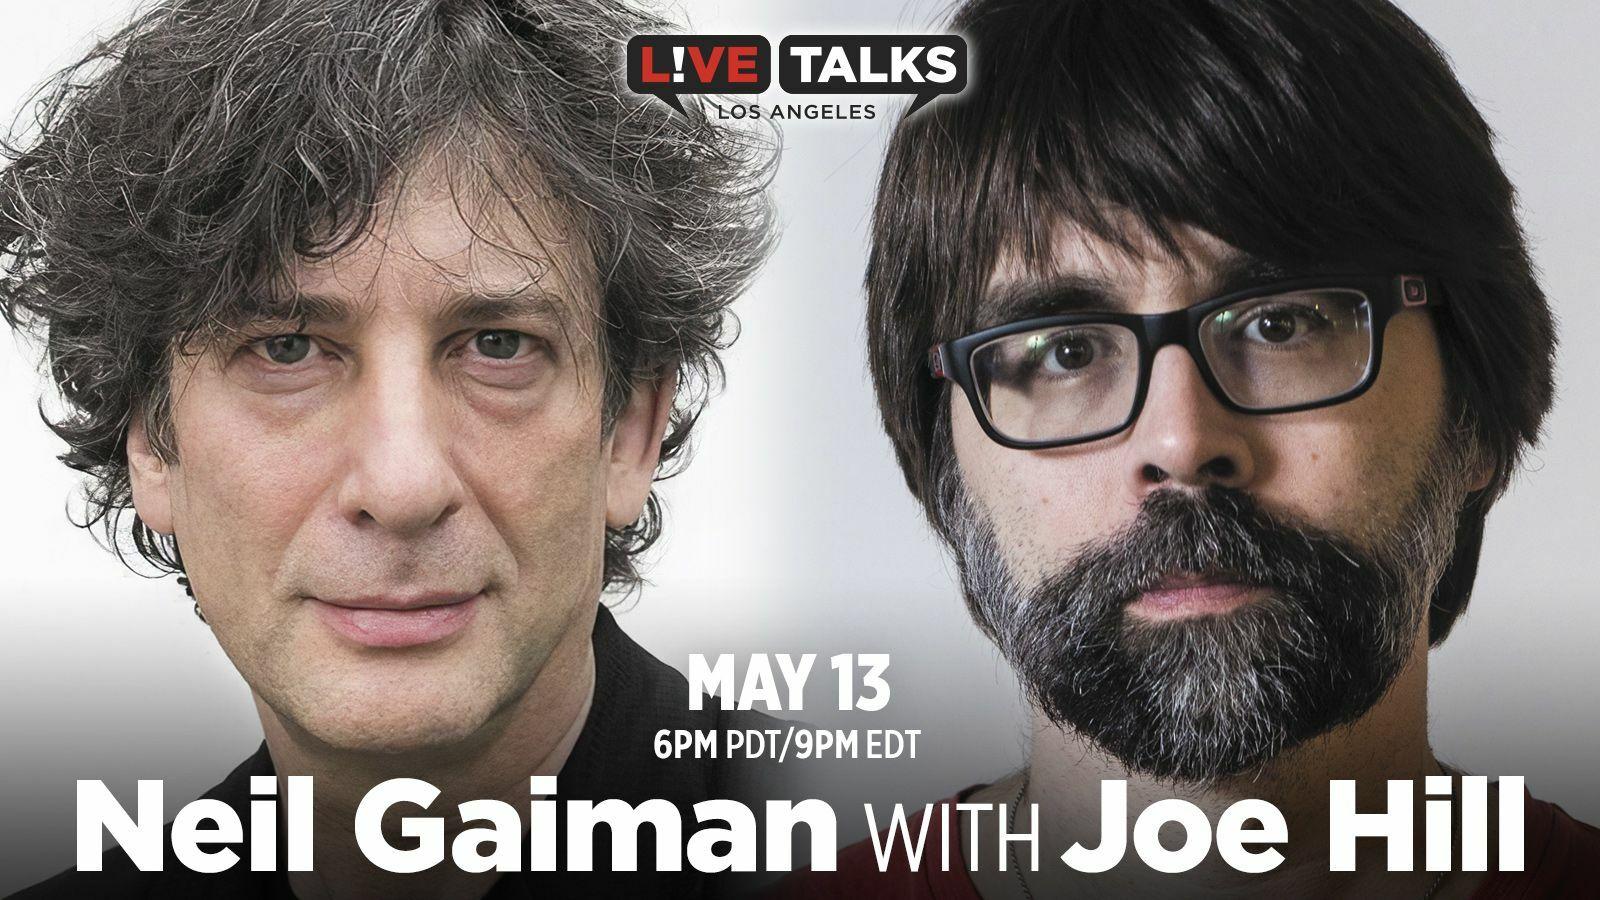 Neil Gaiman with Joe Hill - Online